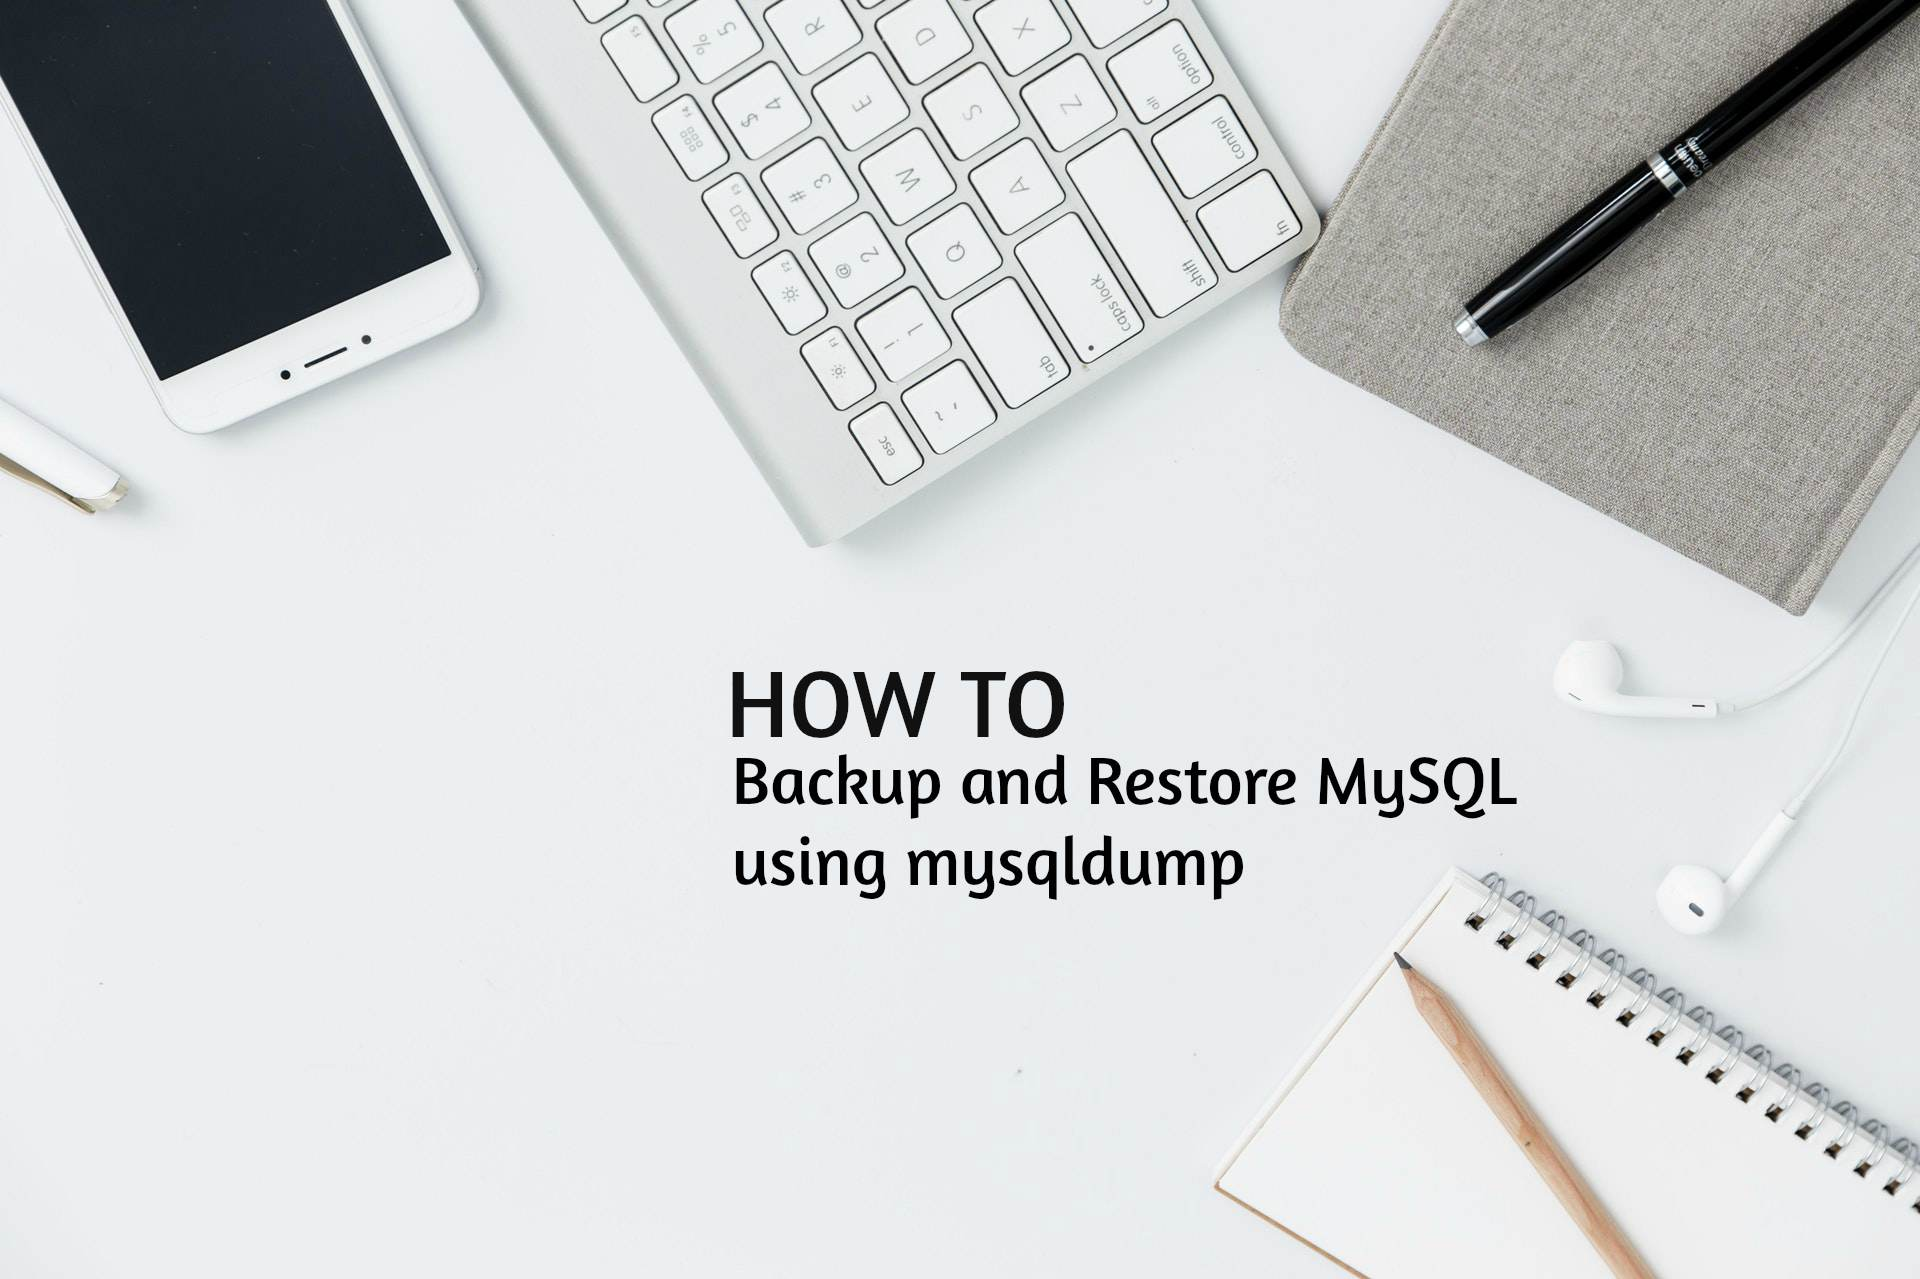 Mysqldump Backup And Restore Tutorial For Beginner